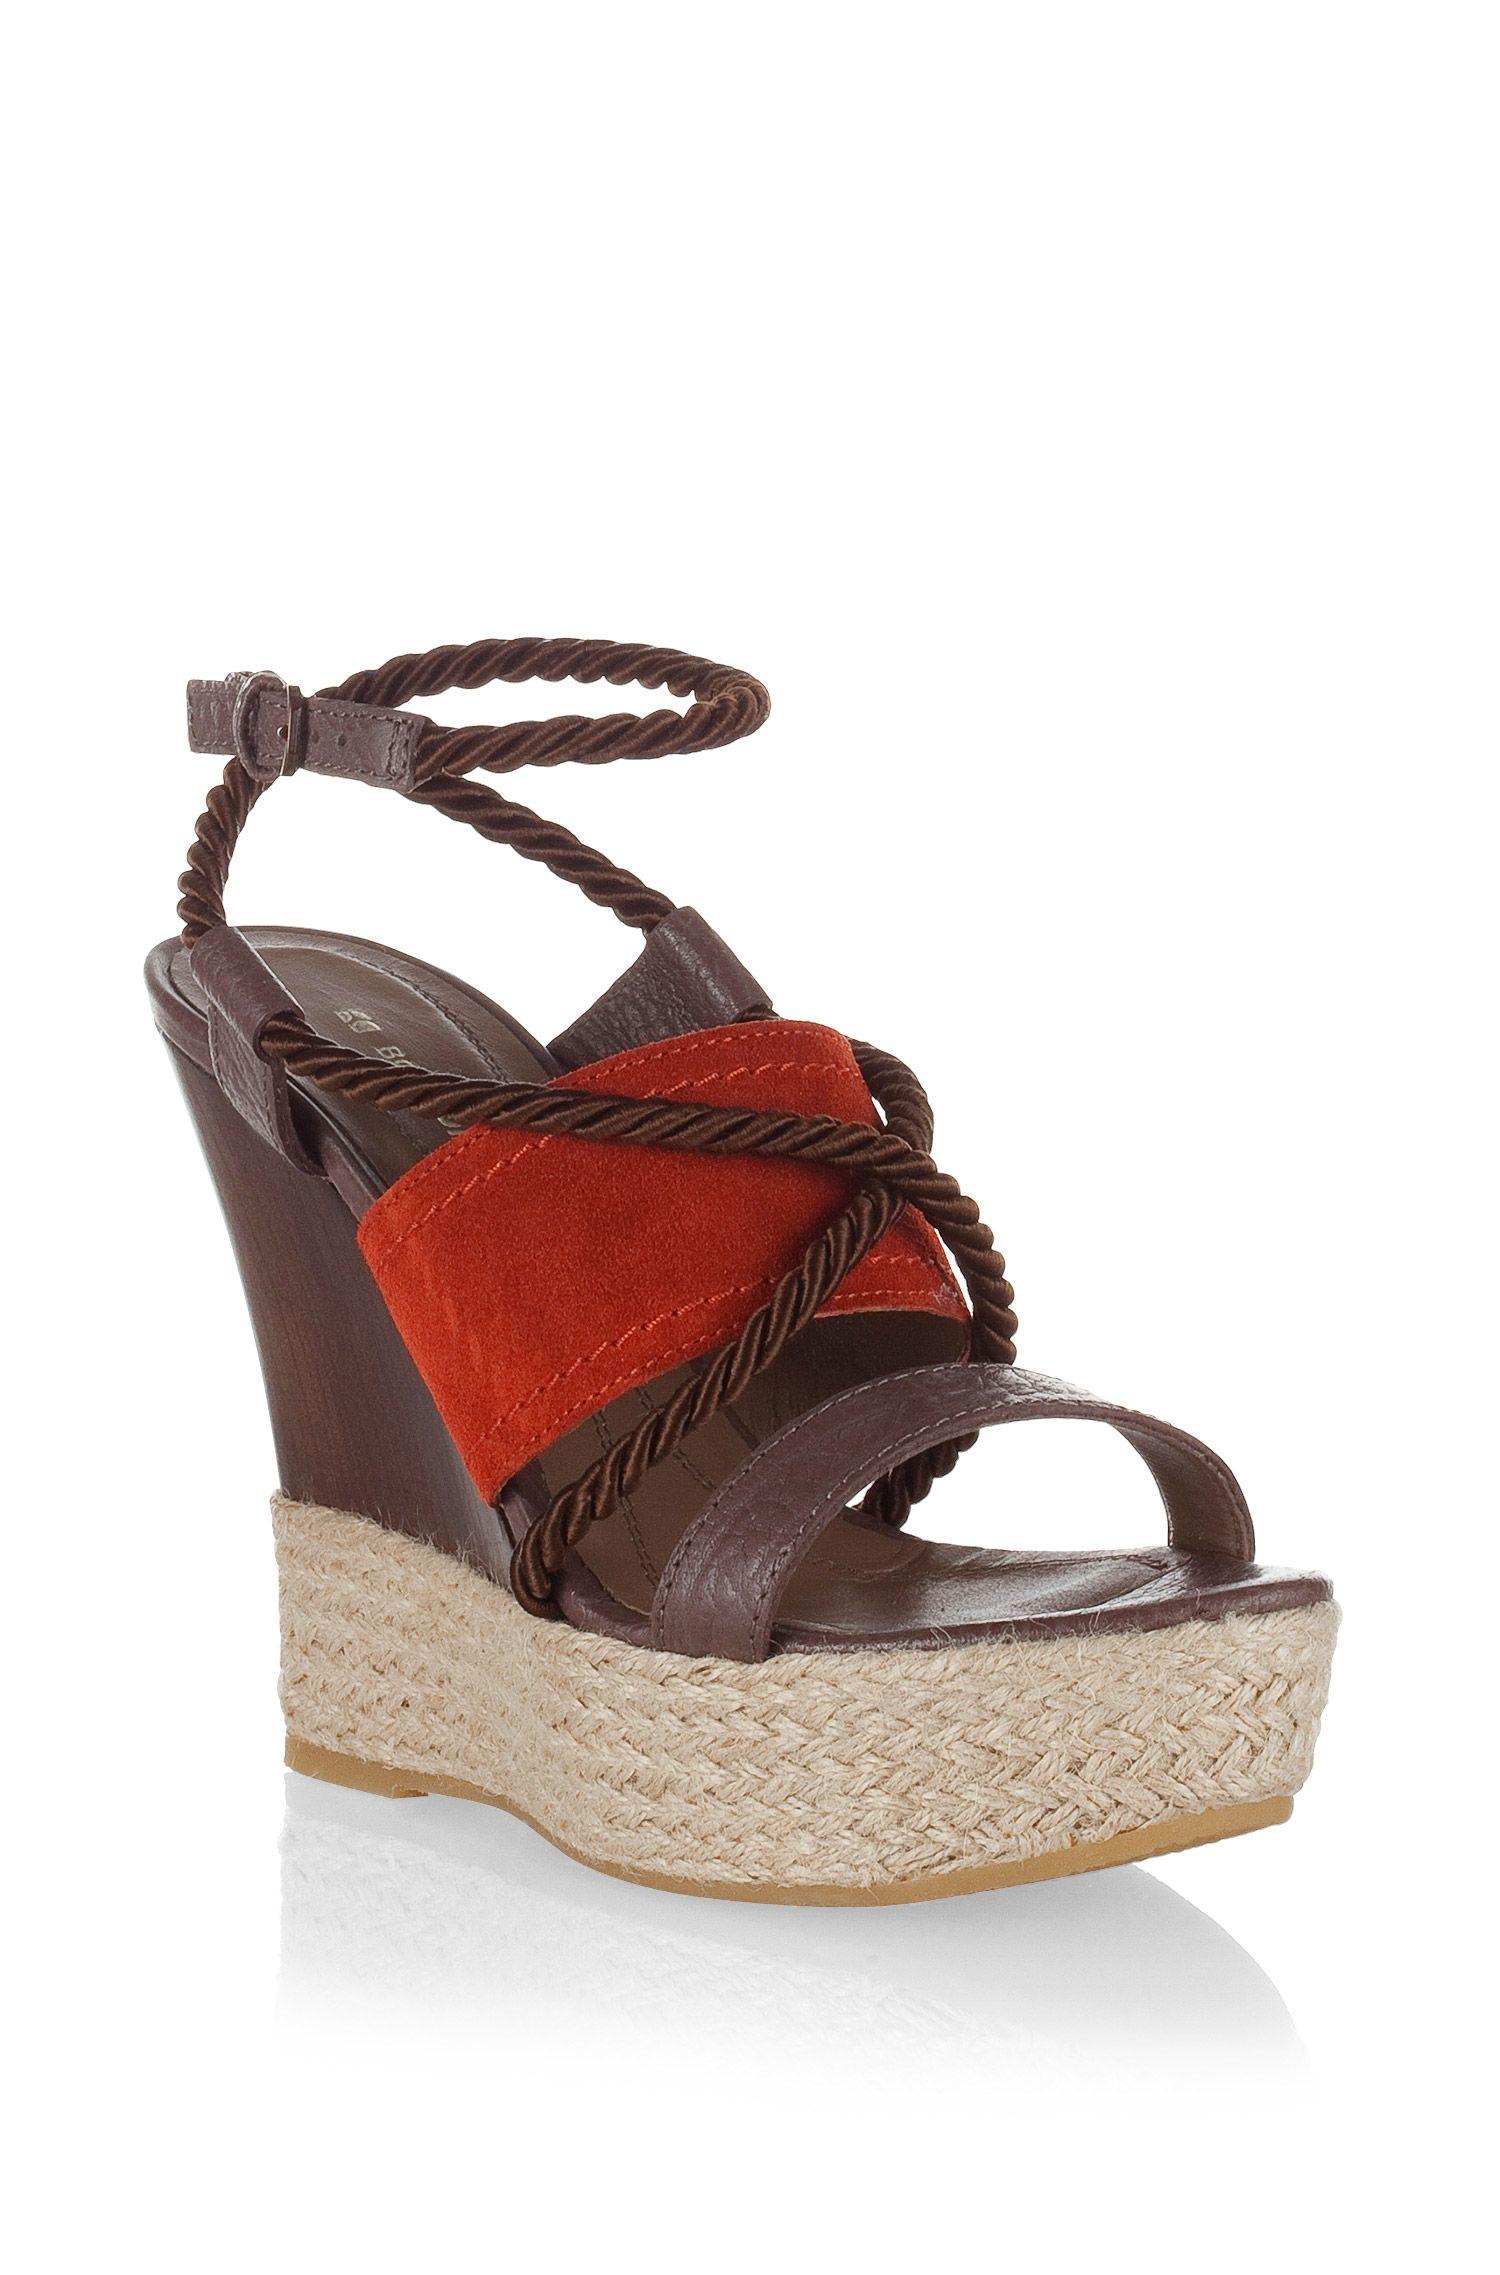 Designer-Sandale ´VIOLE` mit Keilabsatz